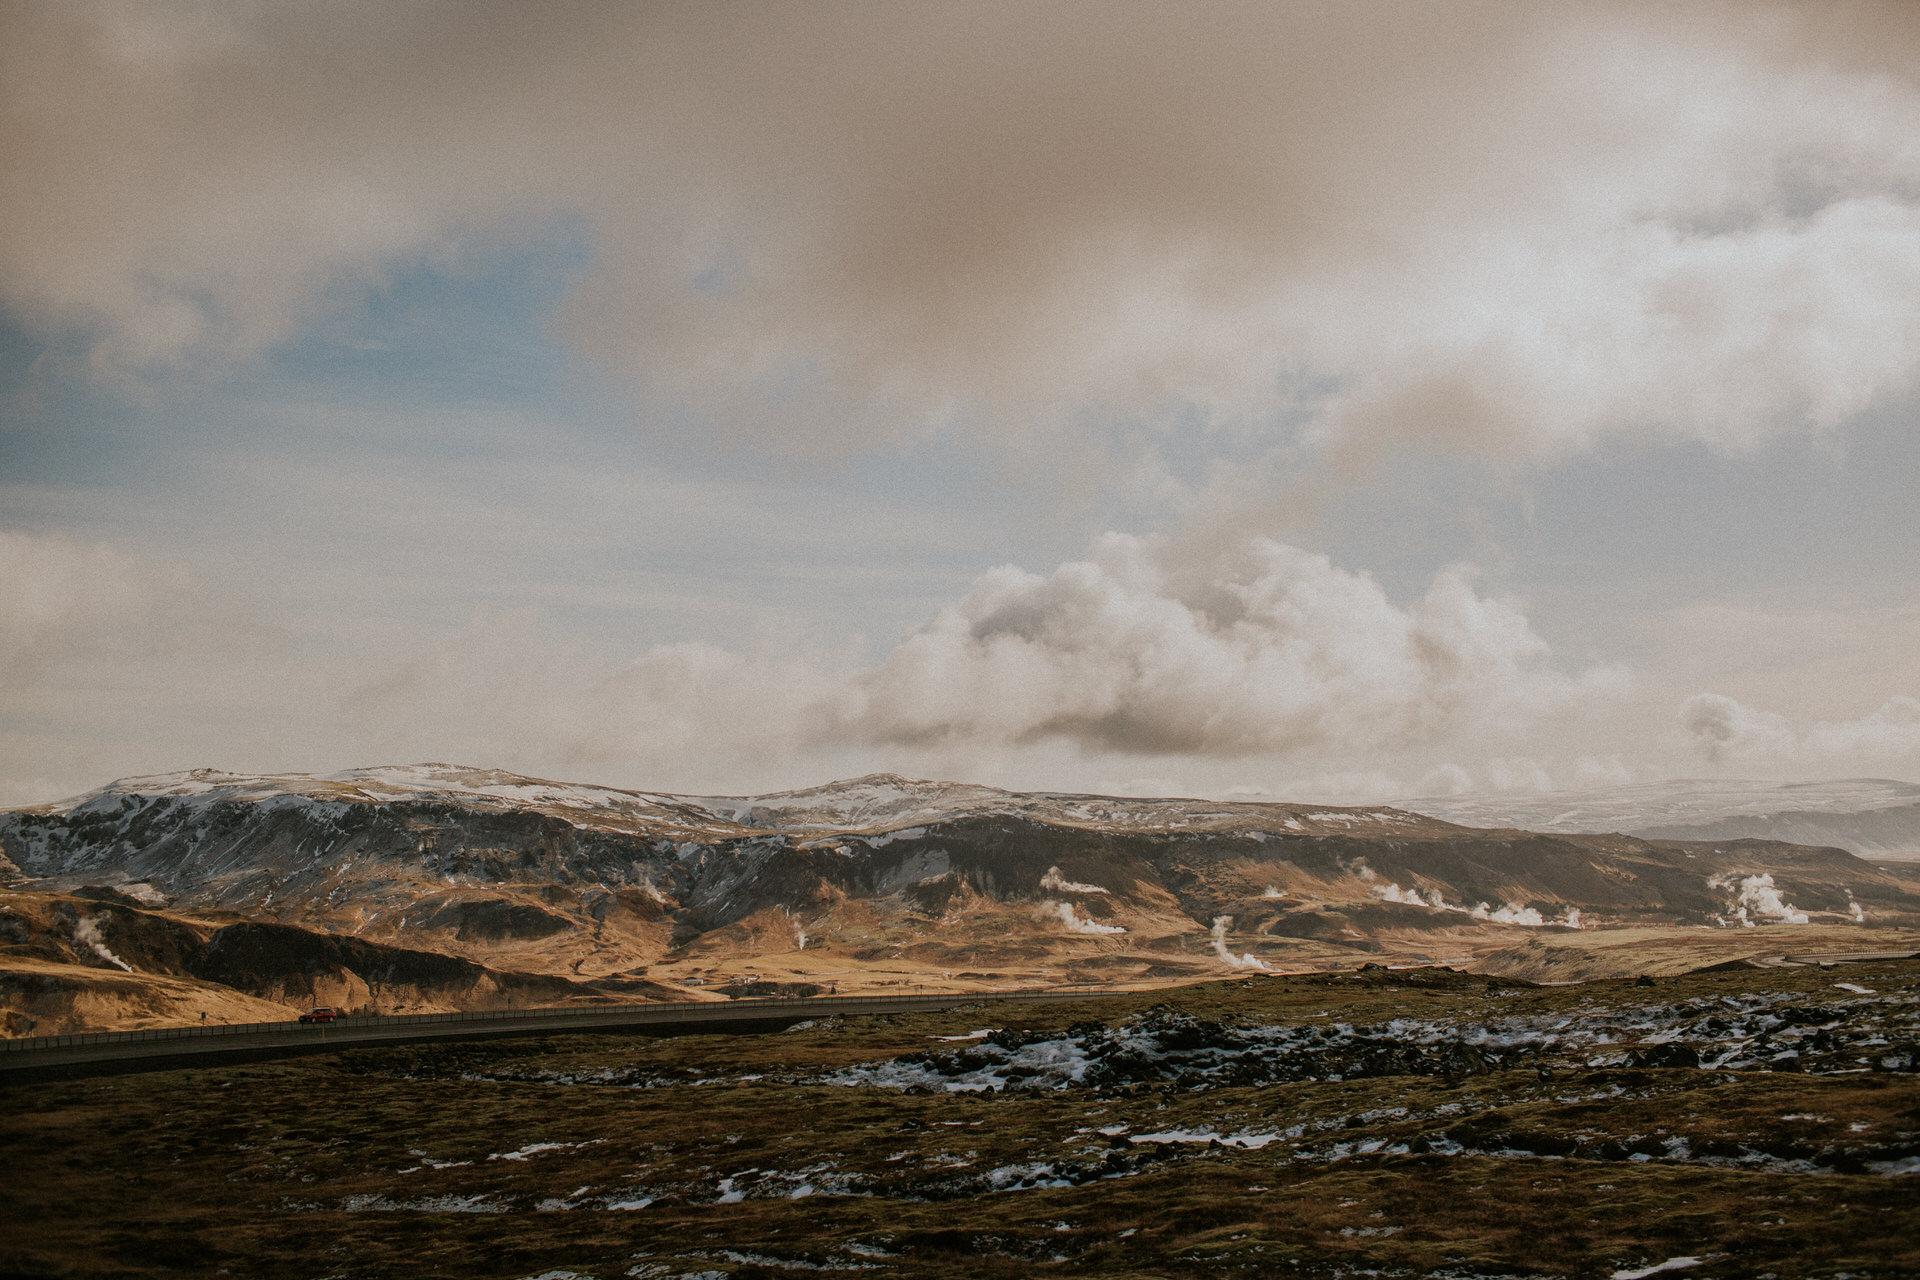 iceland photography engagement sesja narzeczenska islandia - 033.jpg